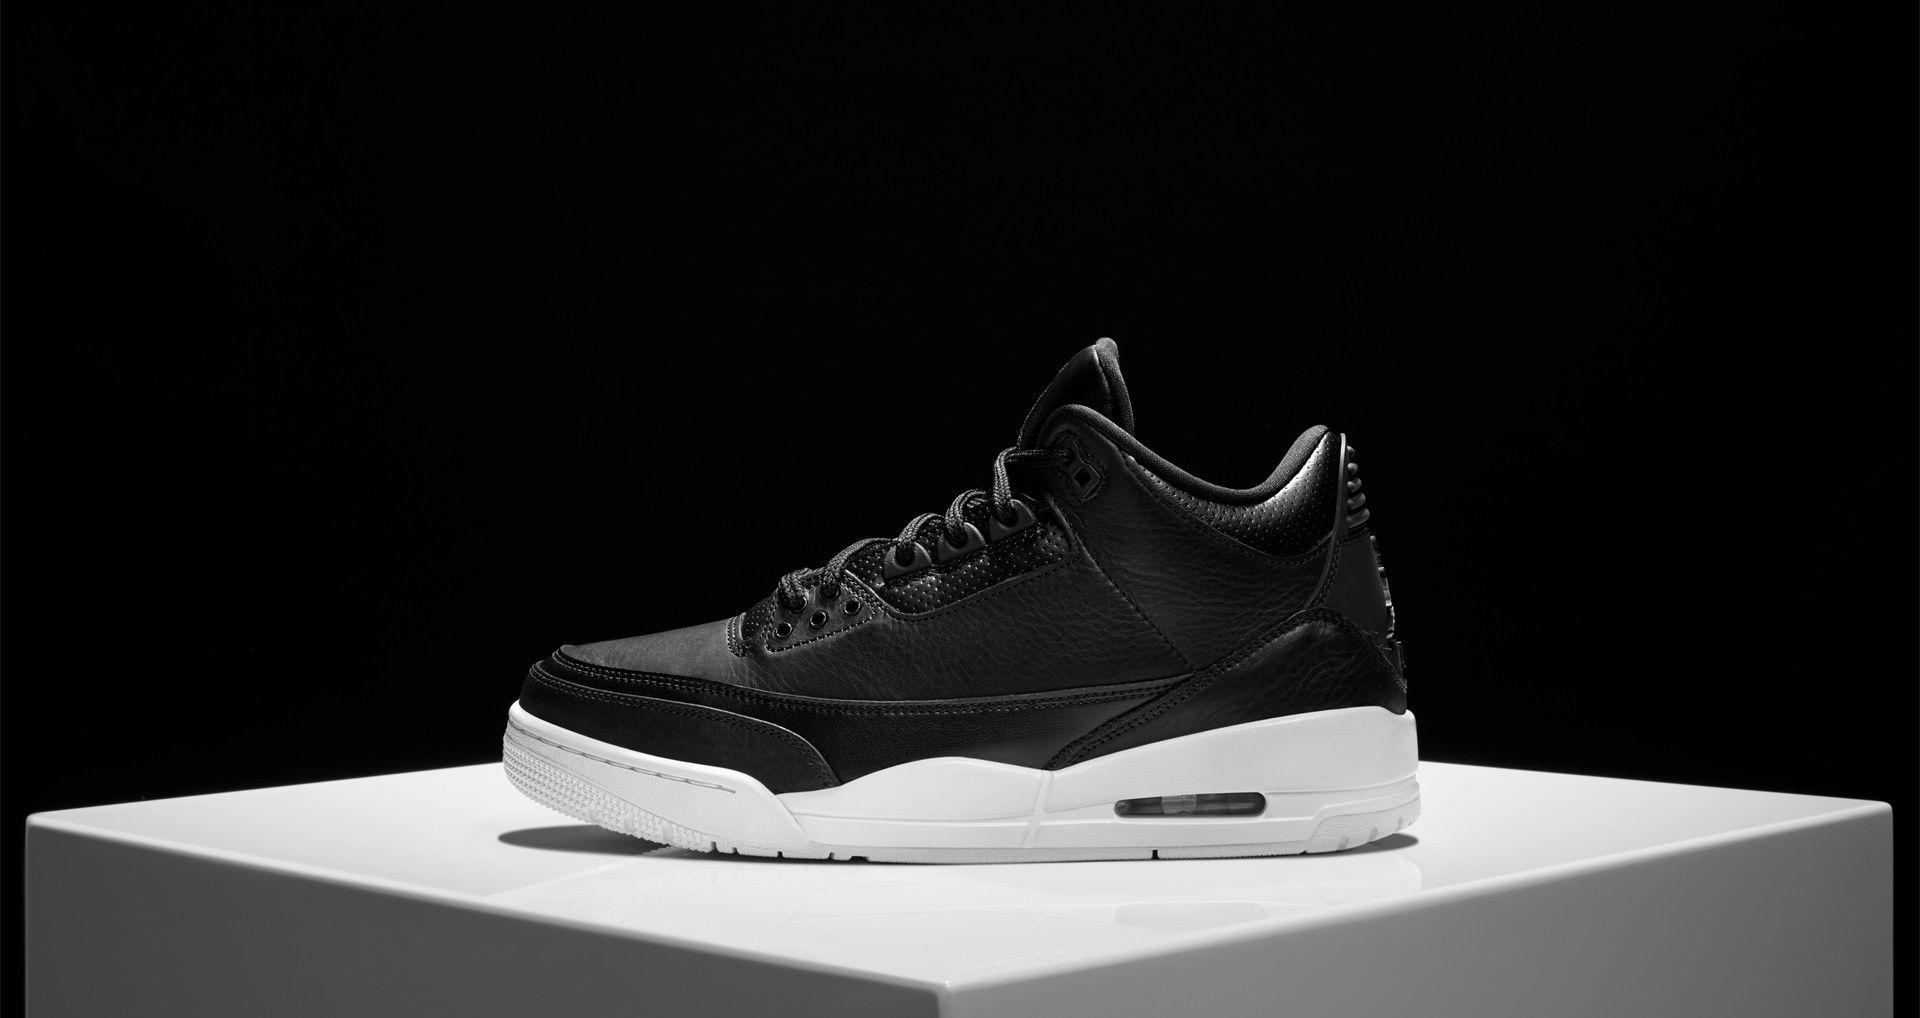 on sale 6b560 a6c87 October 15, 2016 Air Jordan III Retro Black   White  Nike  Inside  Sneakers